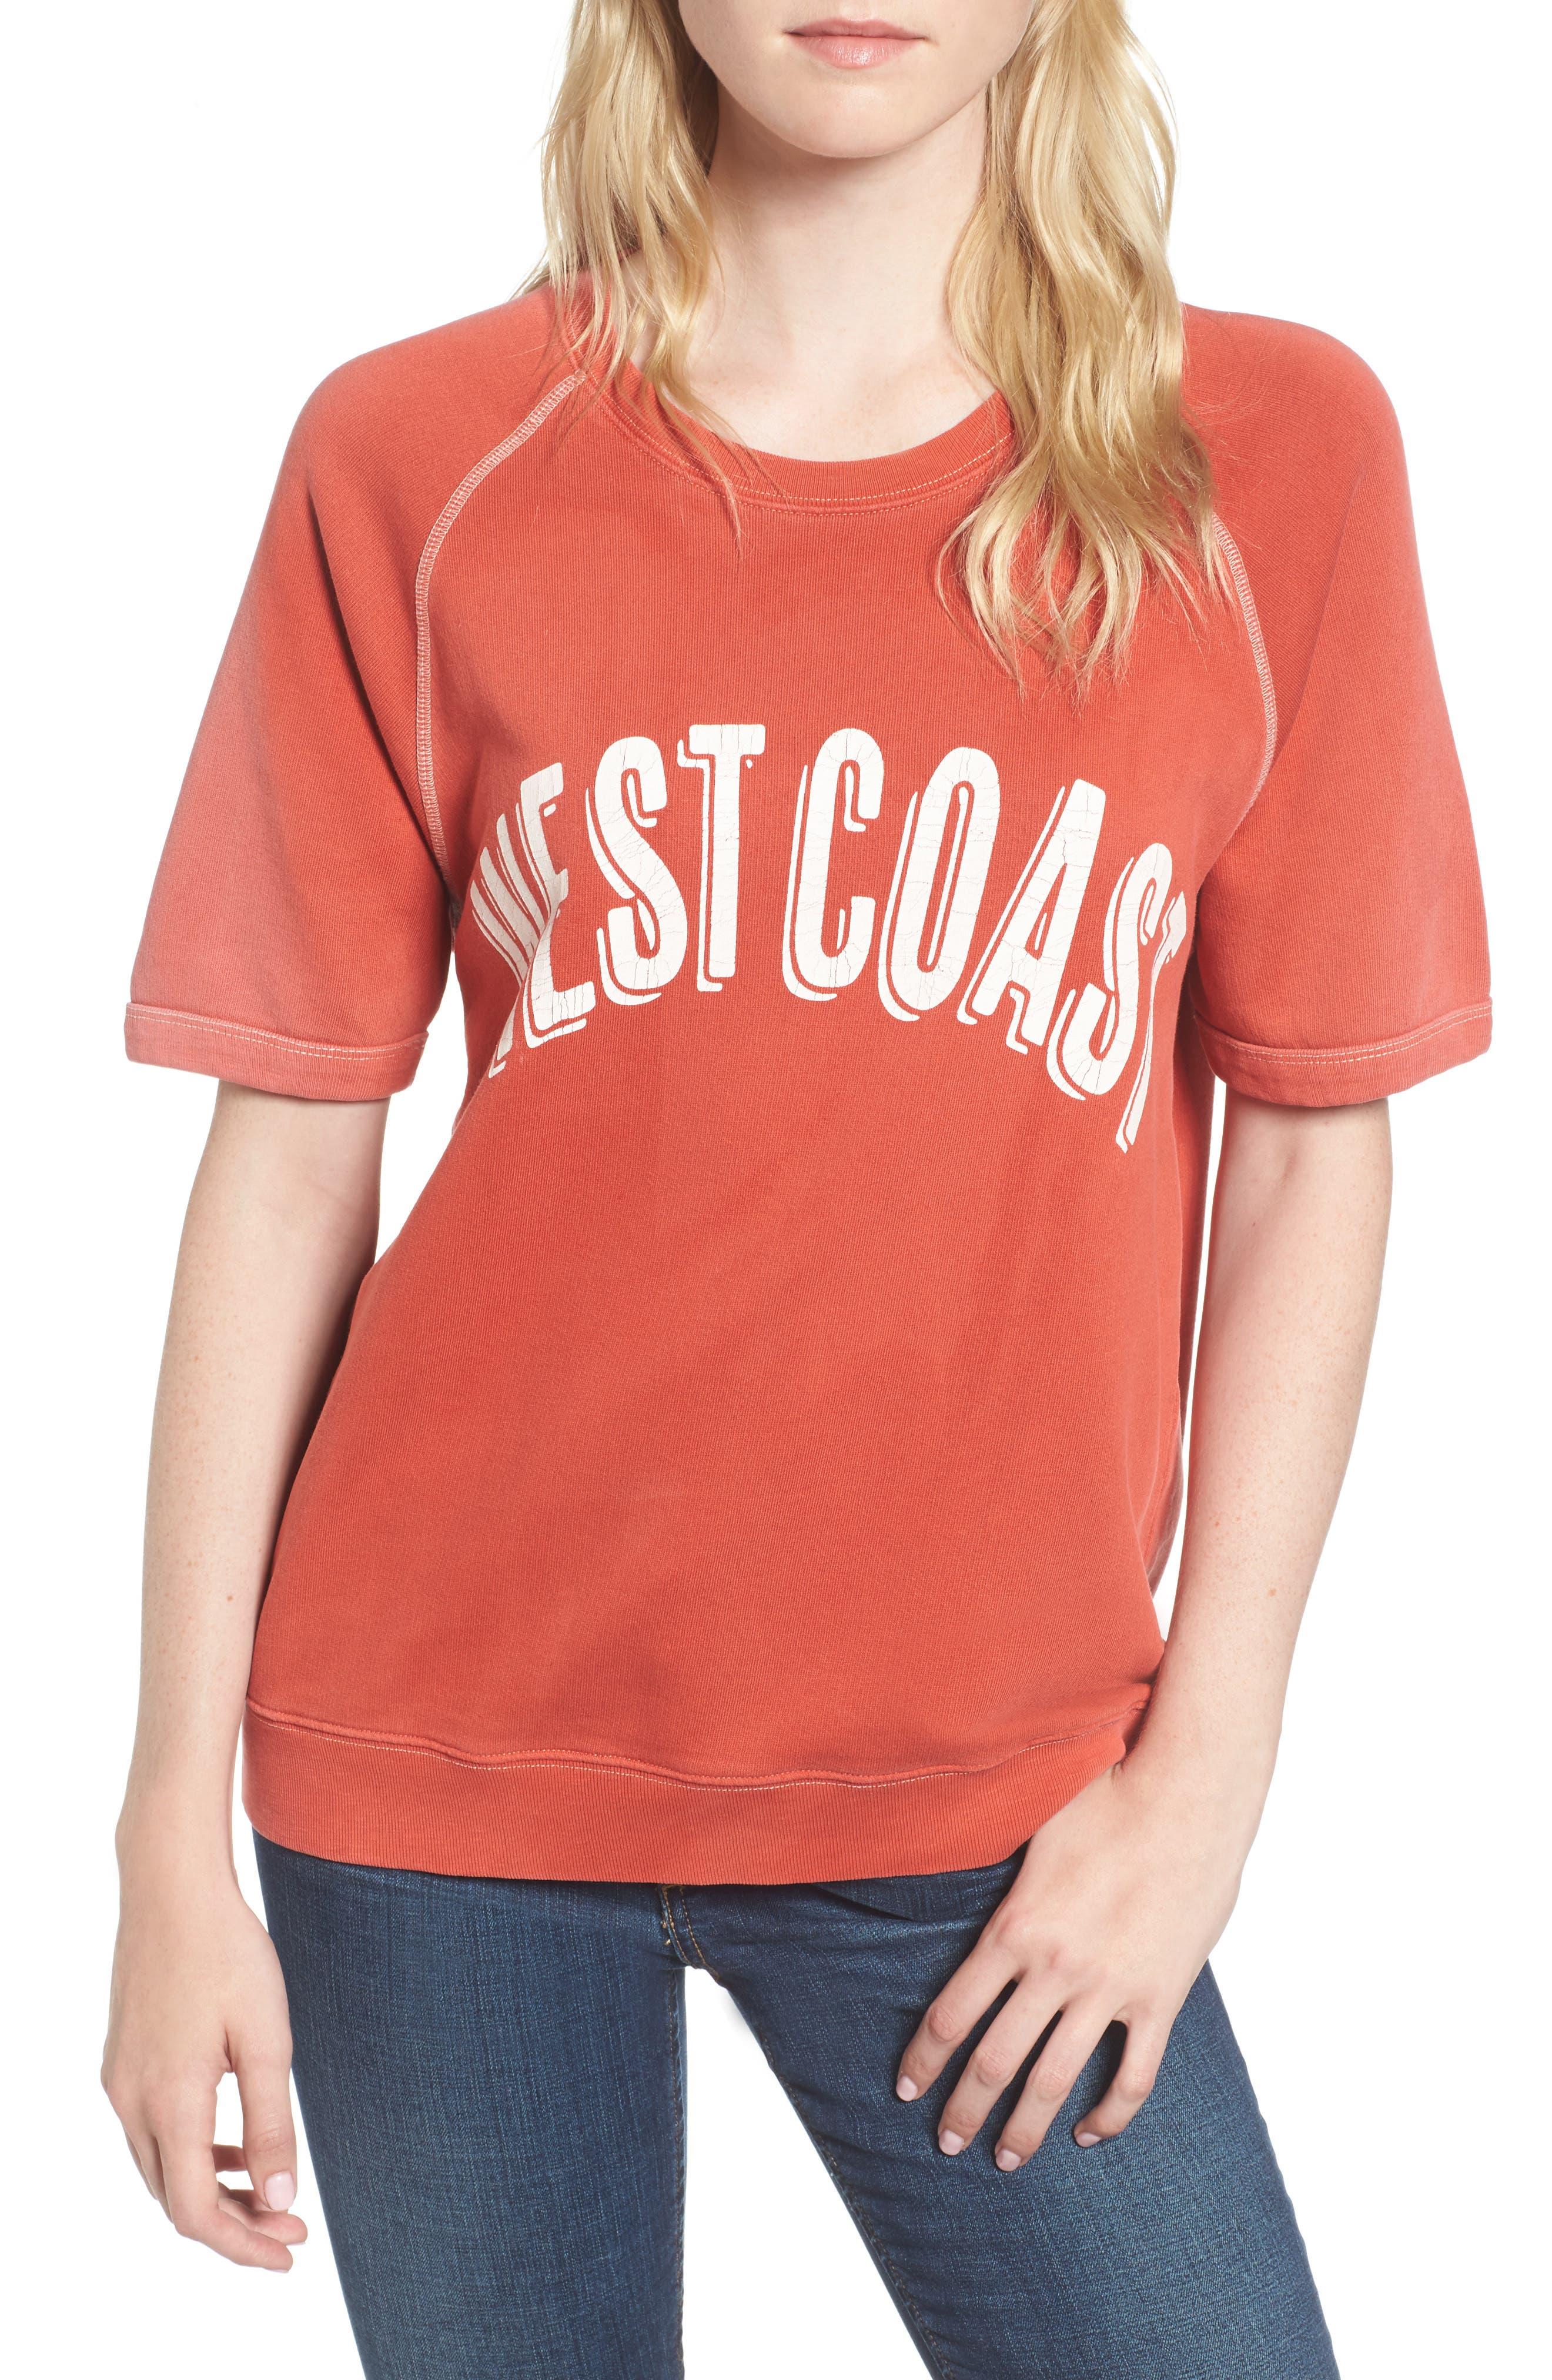 West Coast Sweatshirt,                             Main thumbnail 1, color,                             600